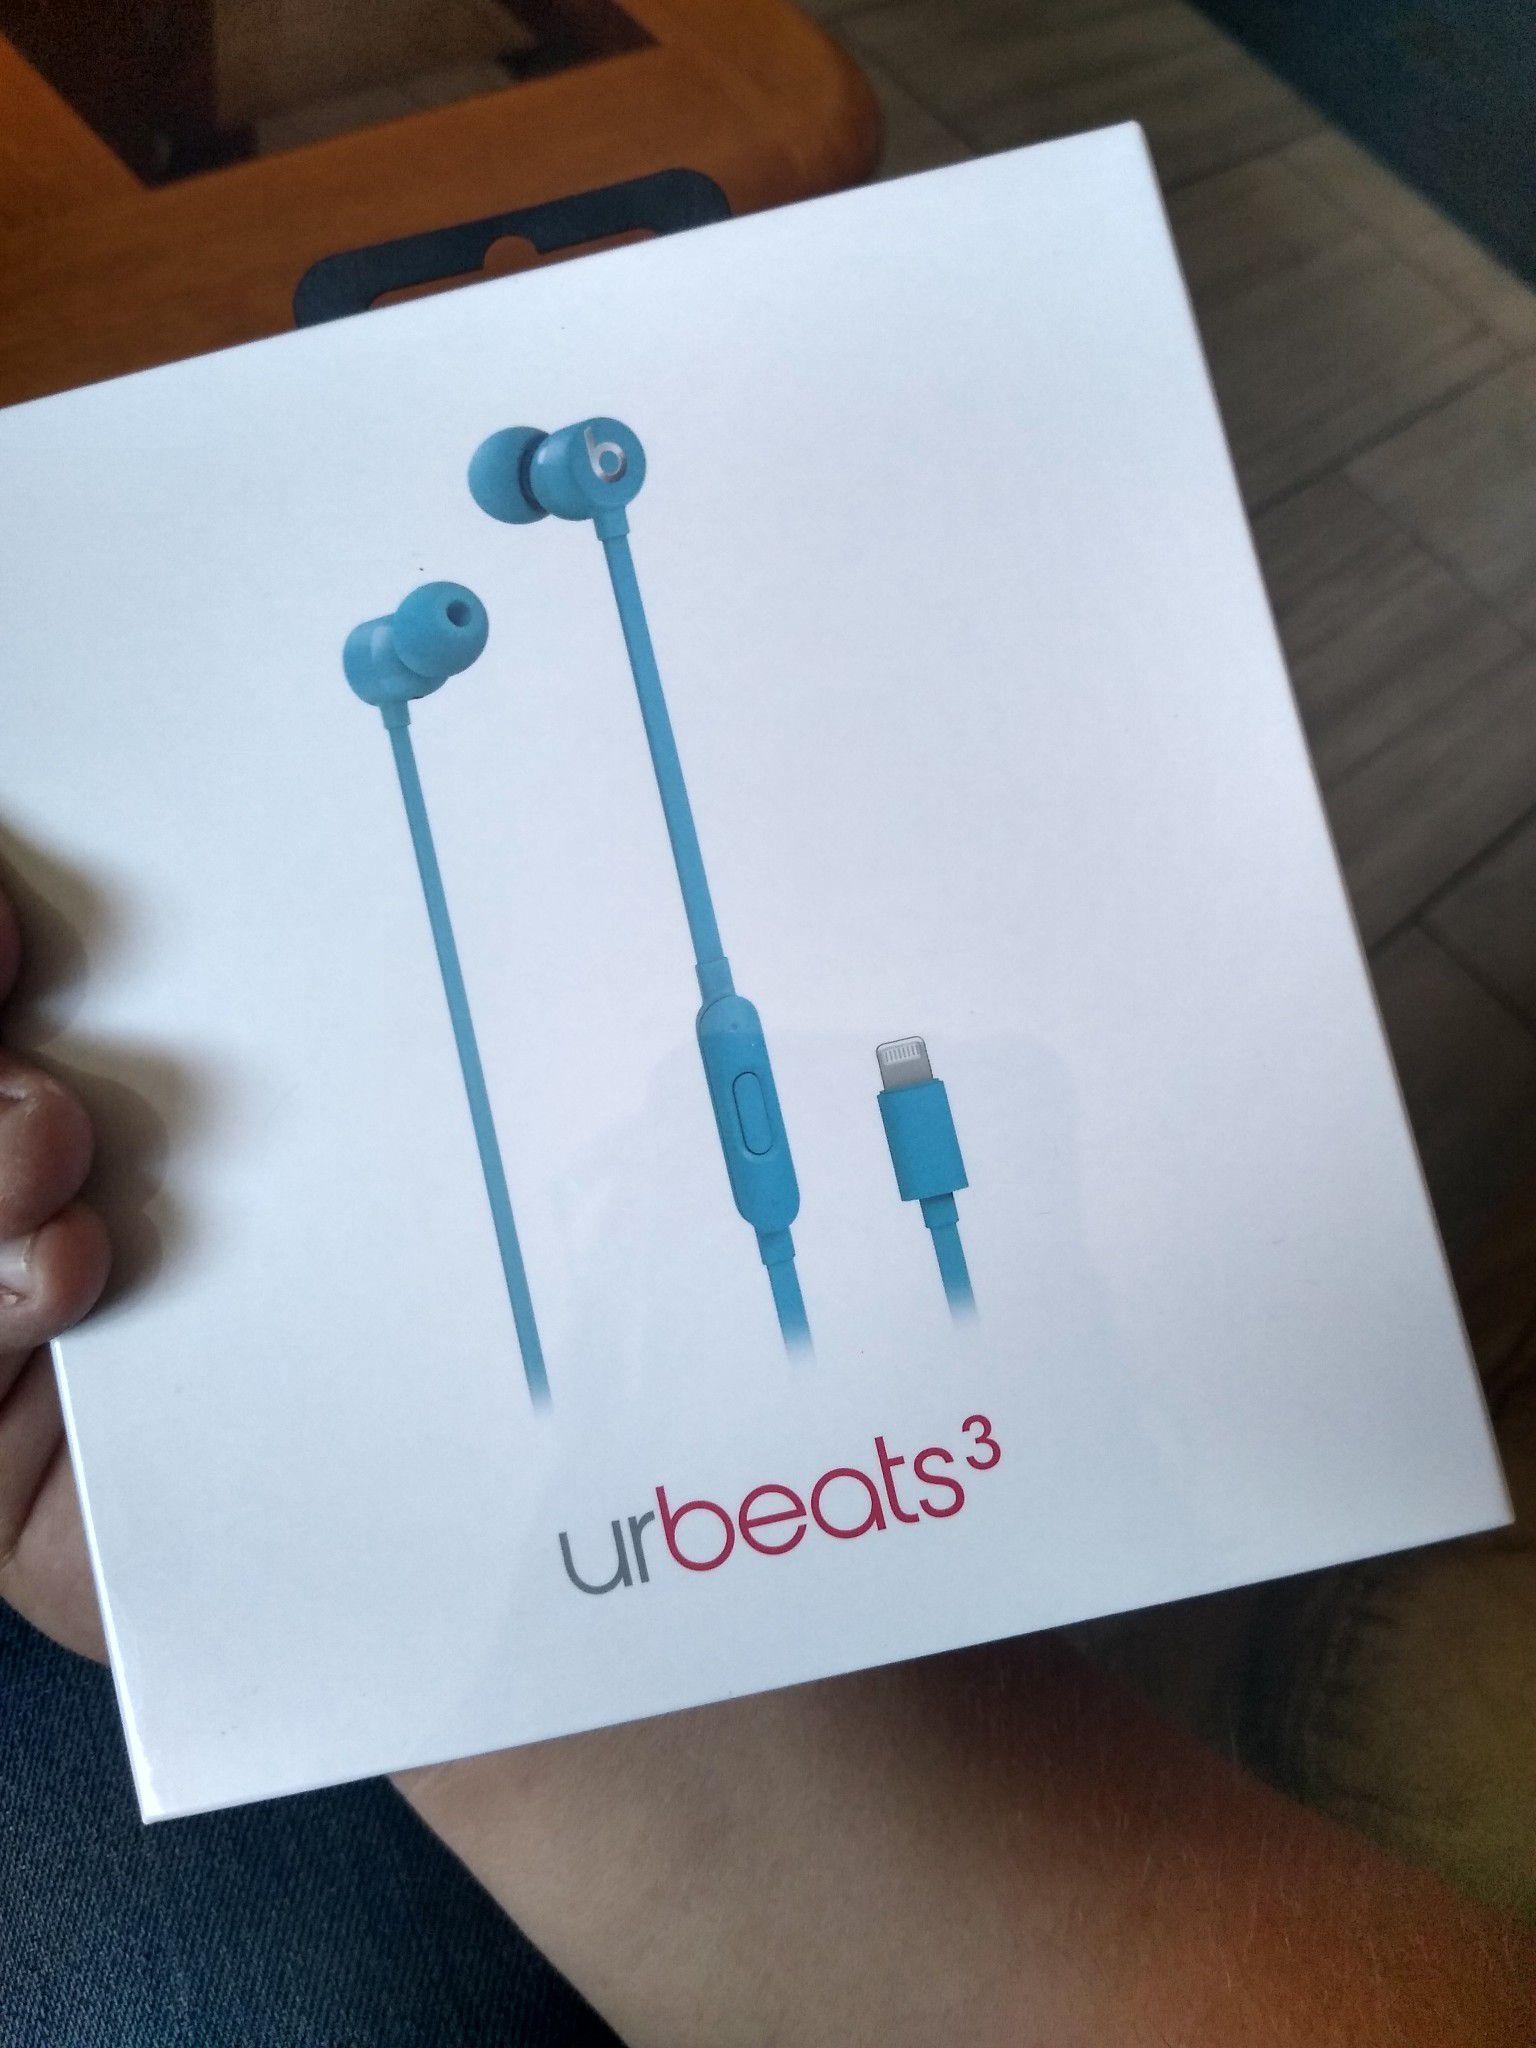 Ur beats 3